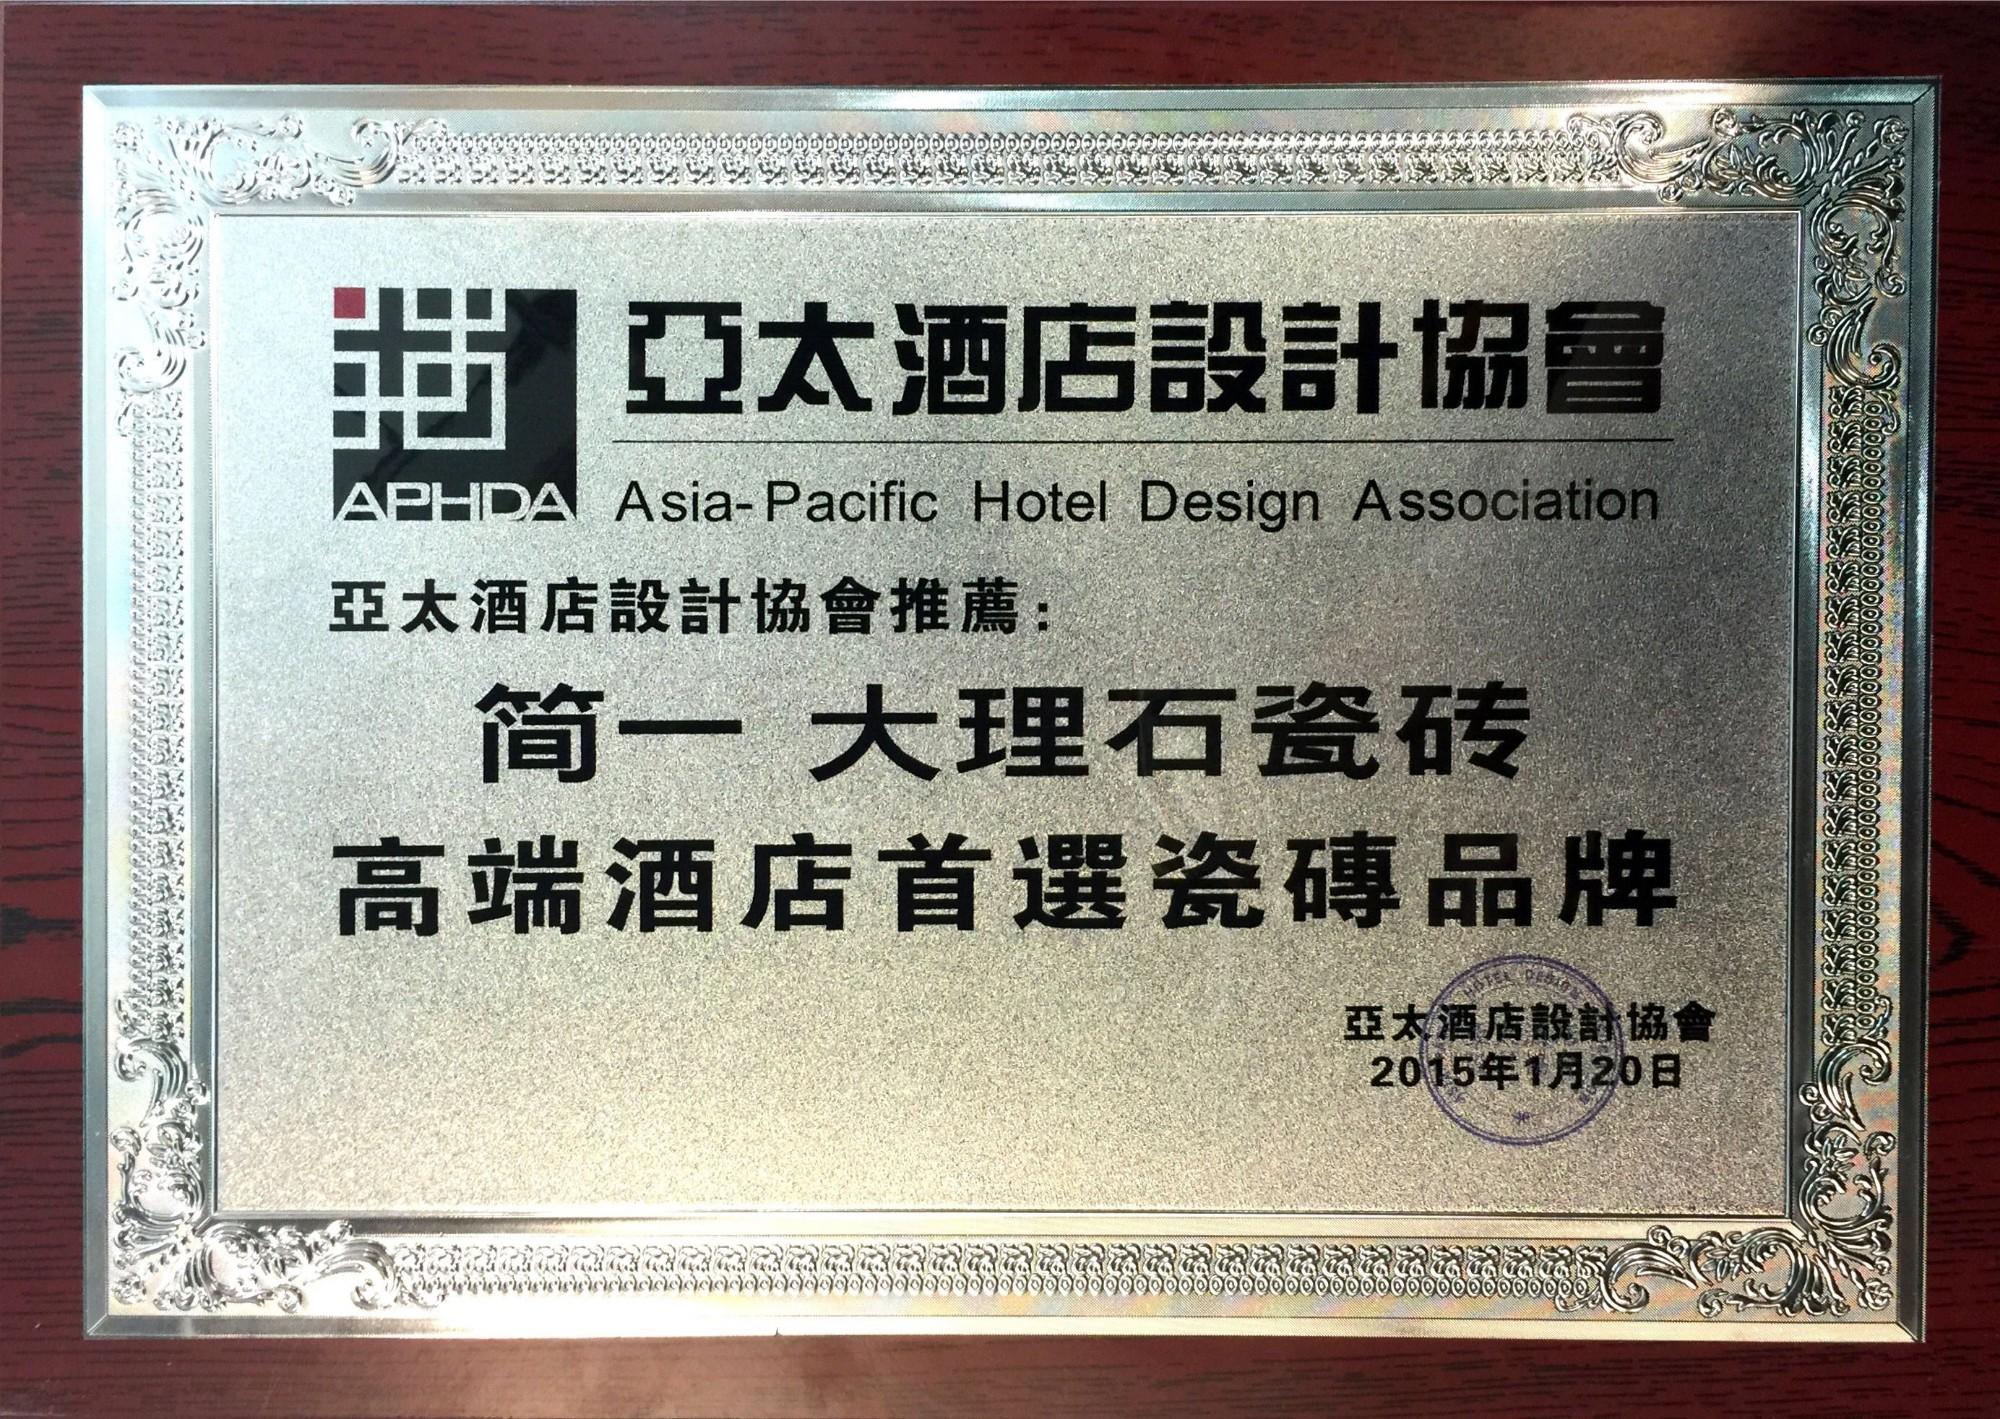 Jenama Pilihan untuk Hotel Mewah yang dianugerahkan oleh Asia Design Pasifik Hotel Design Association